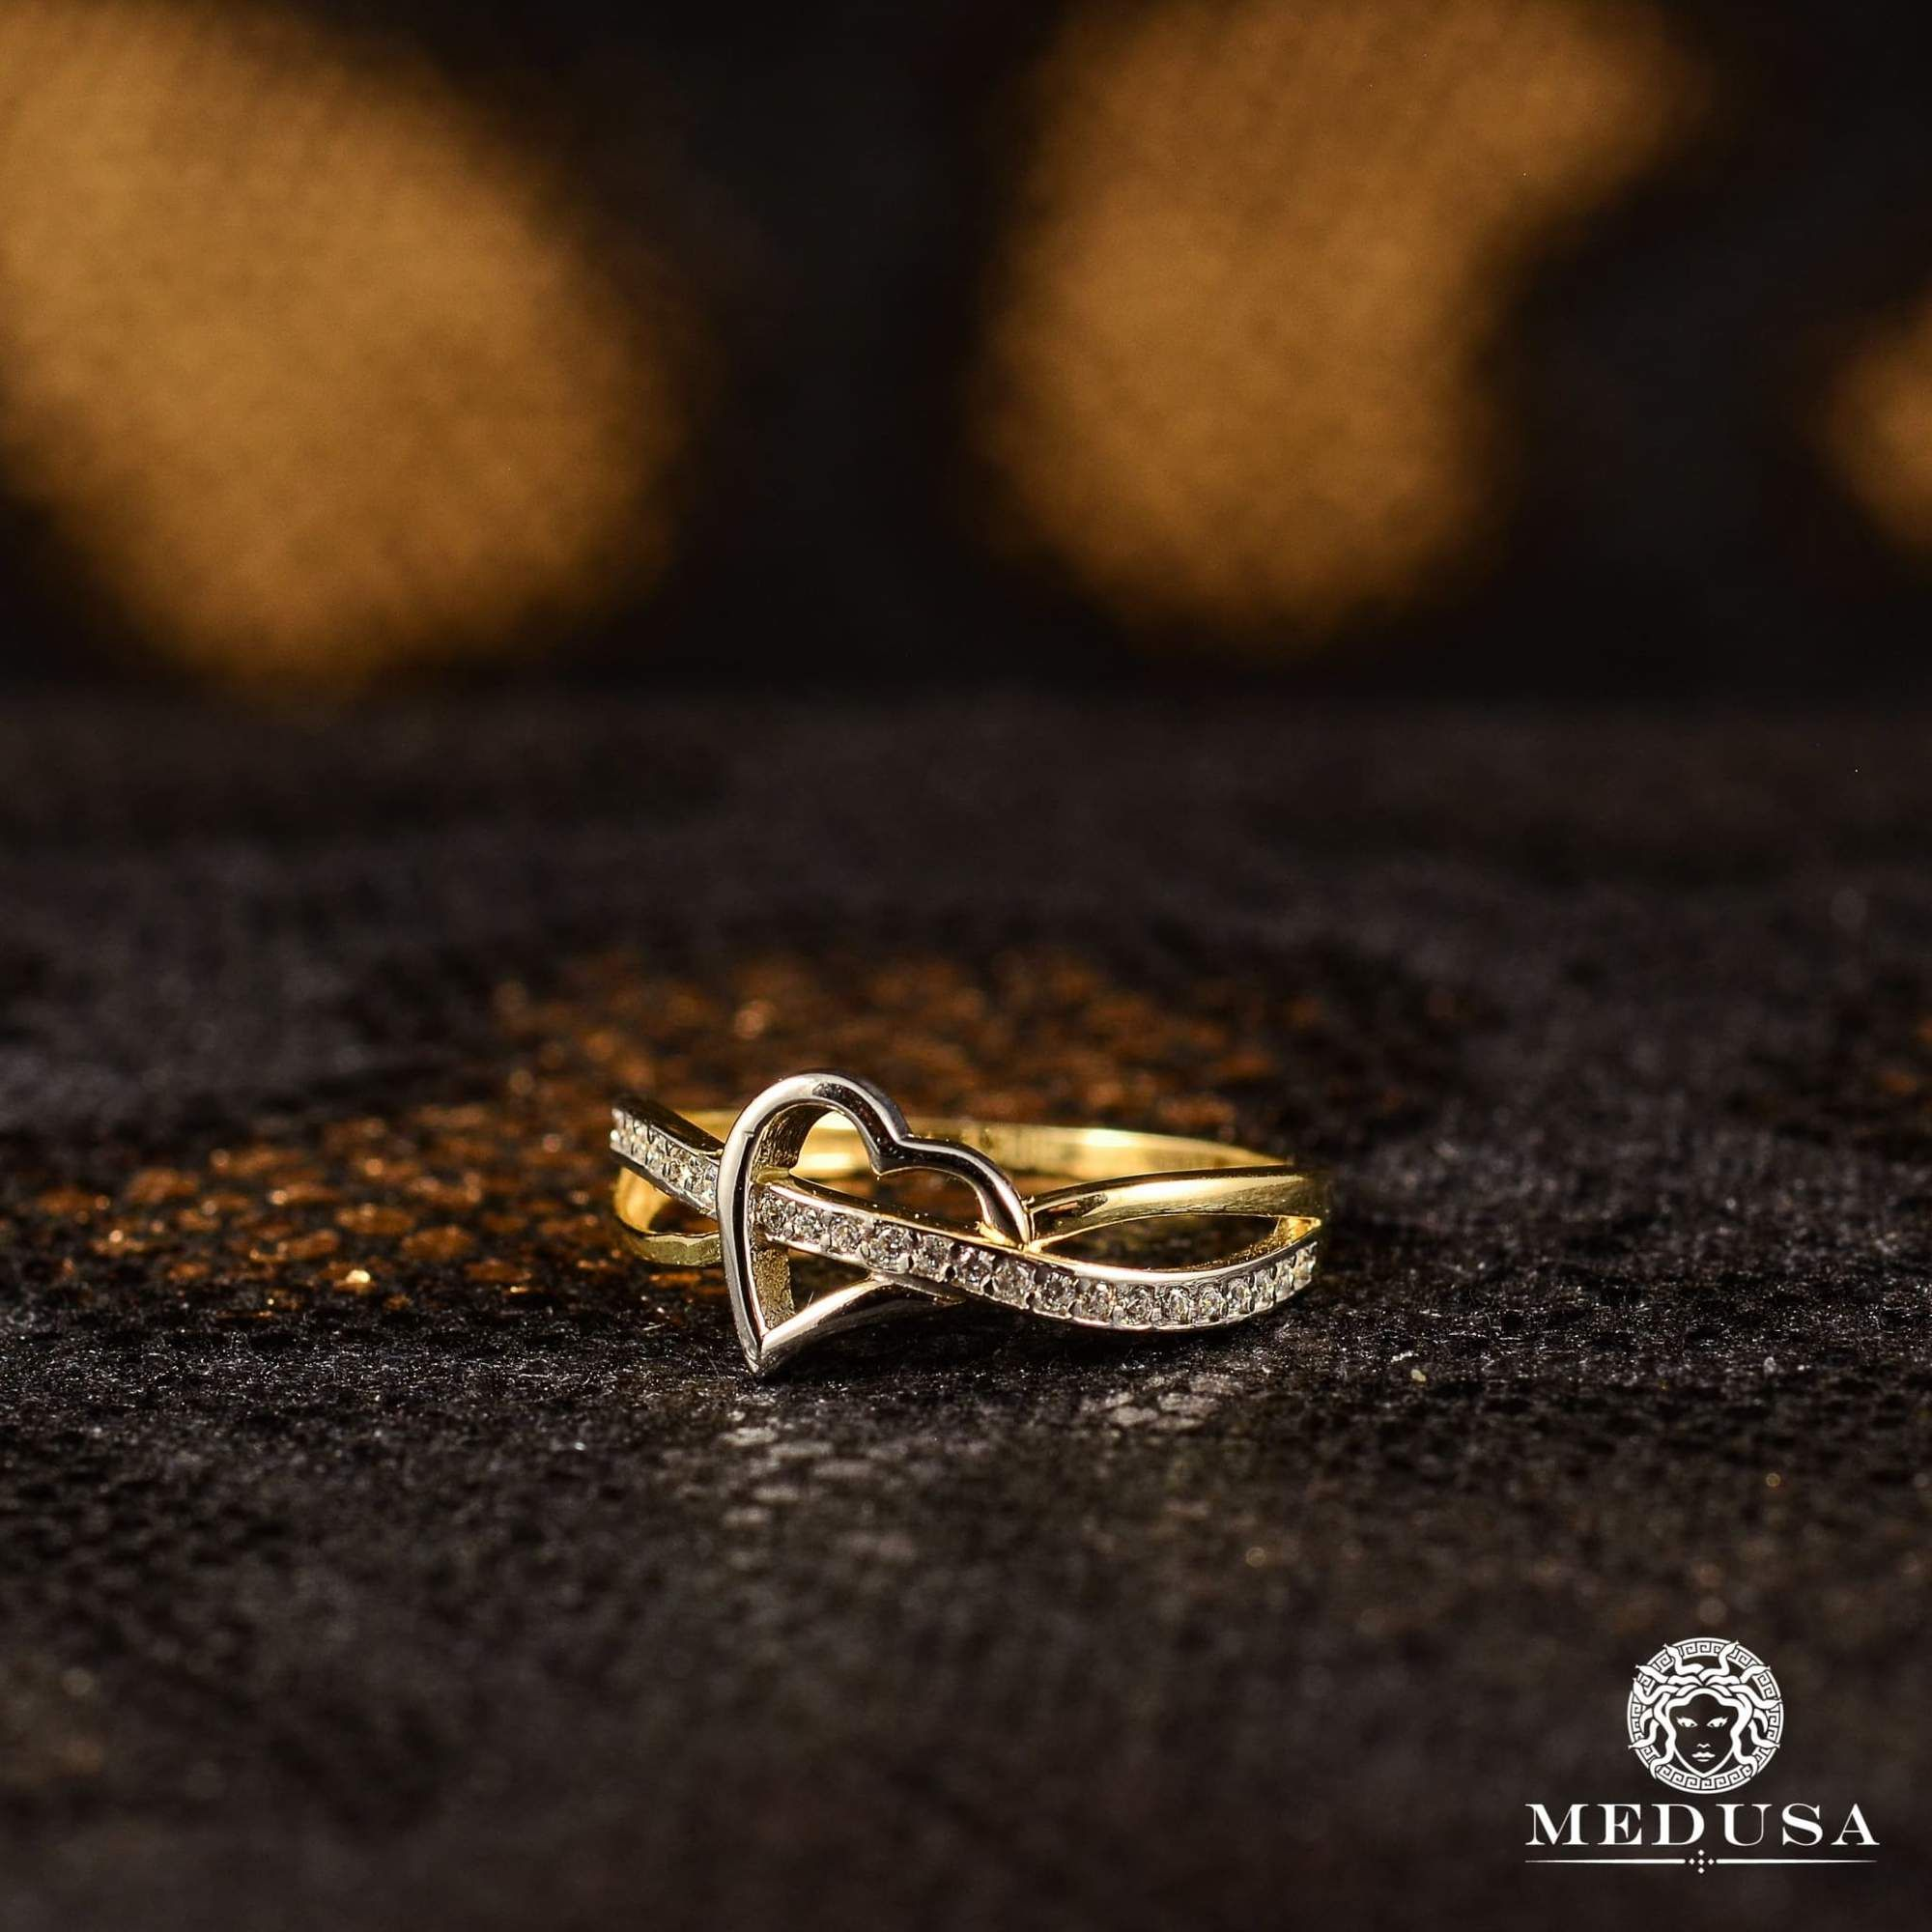 Heart F4 Silver rings, Rings, Engagement rings